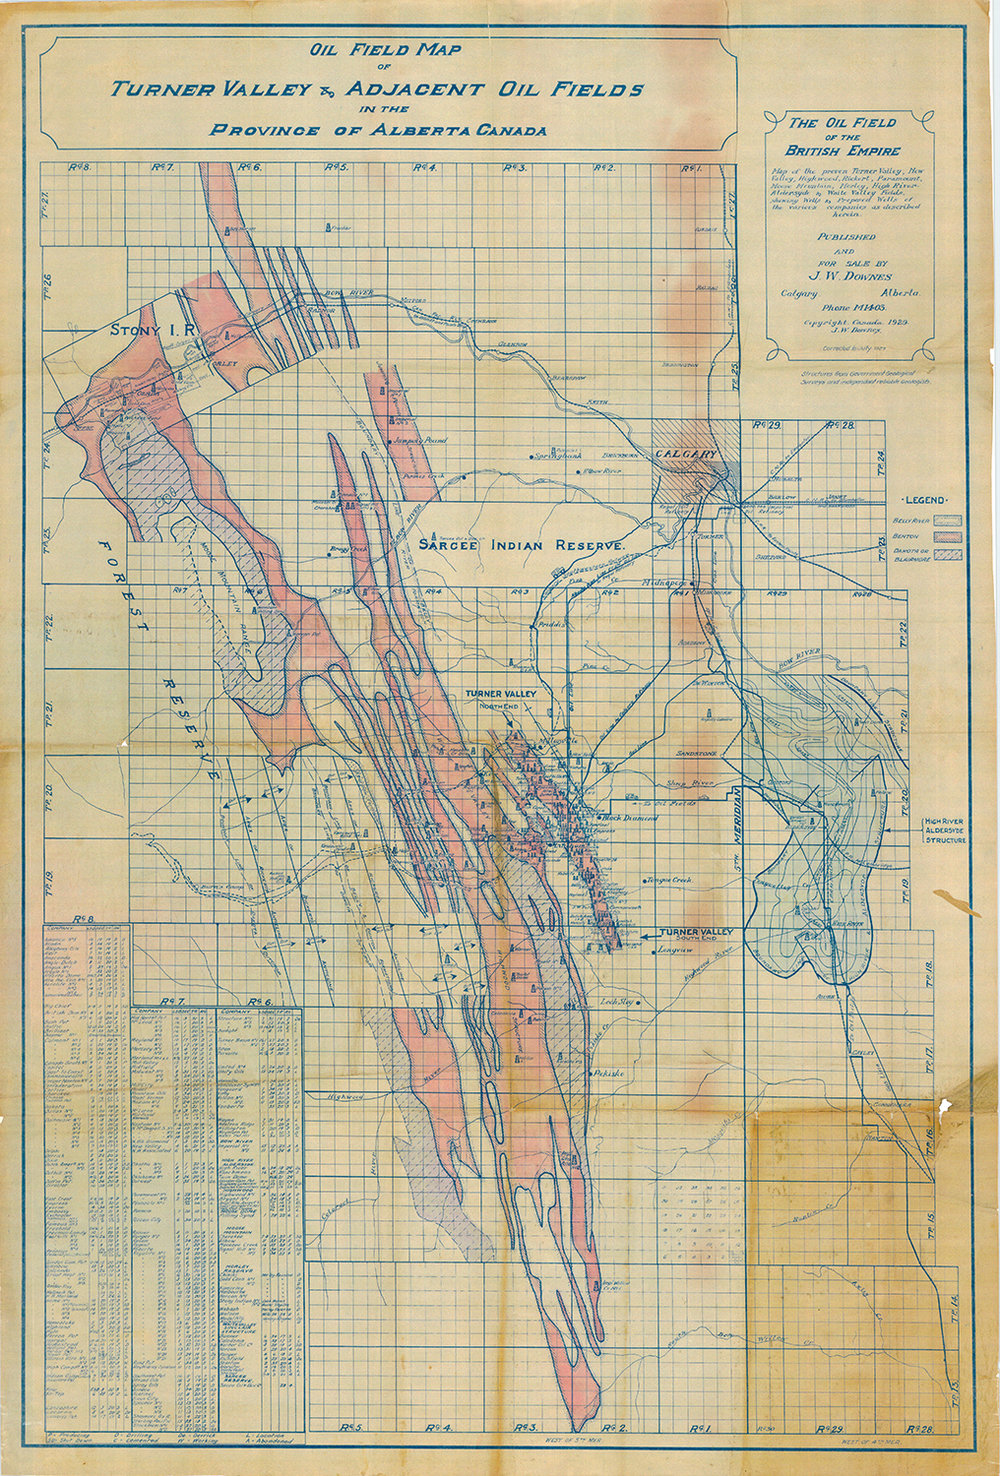 The Oil Field of the British Empire 1929